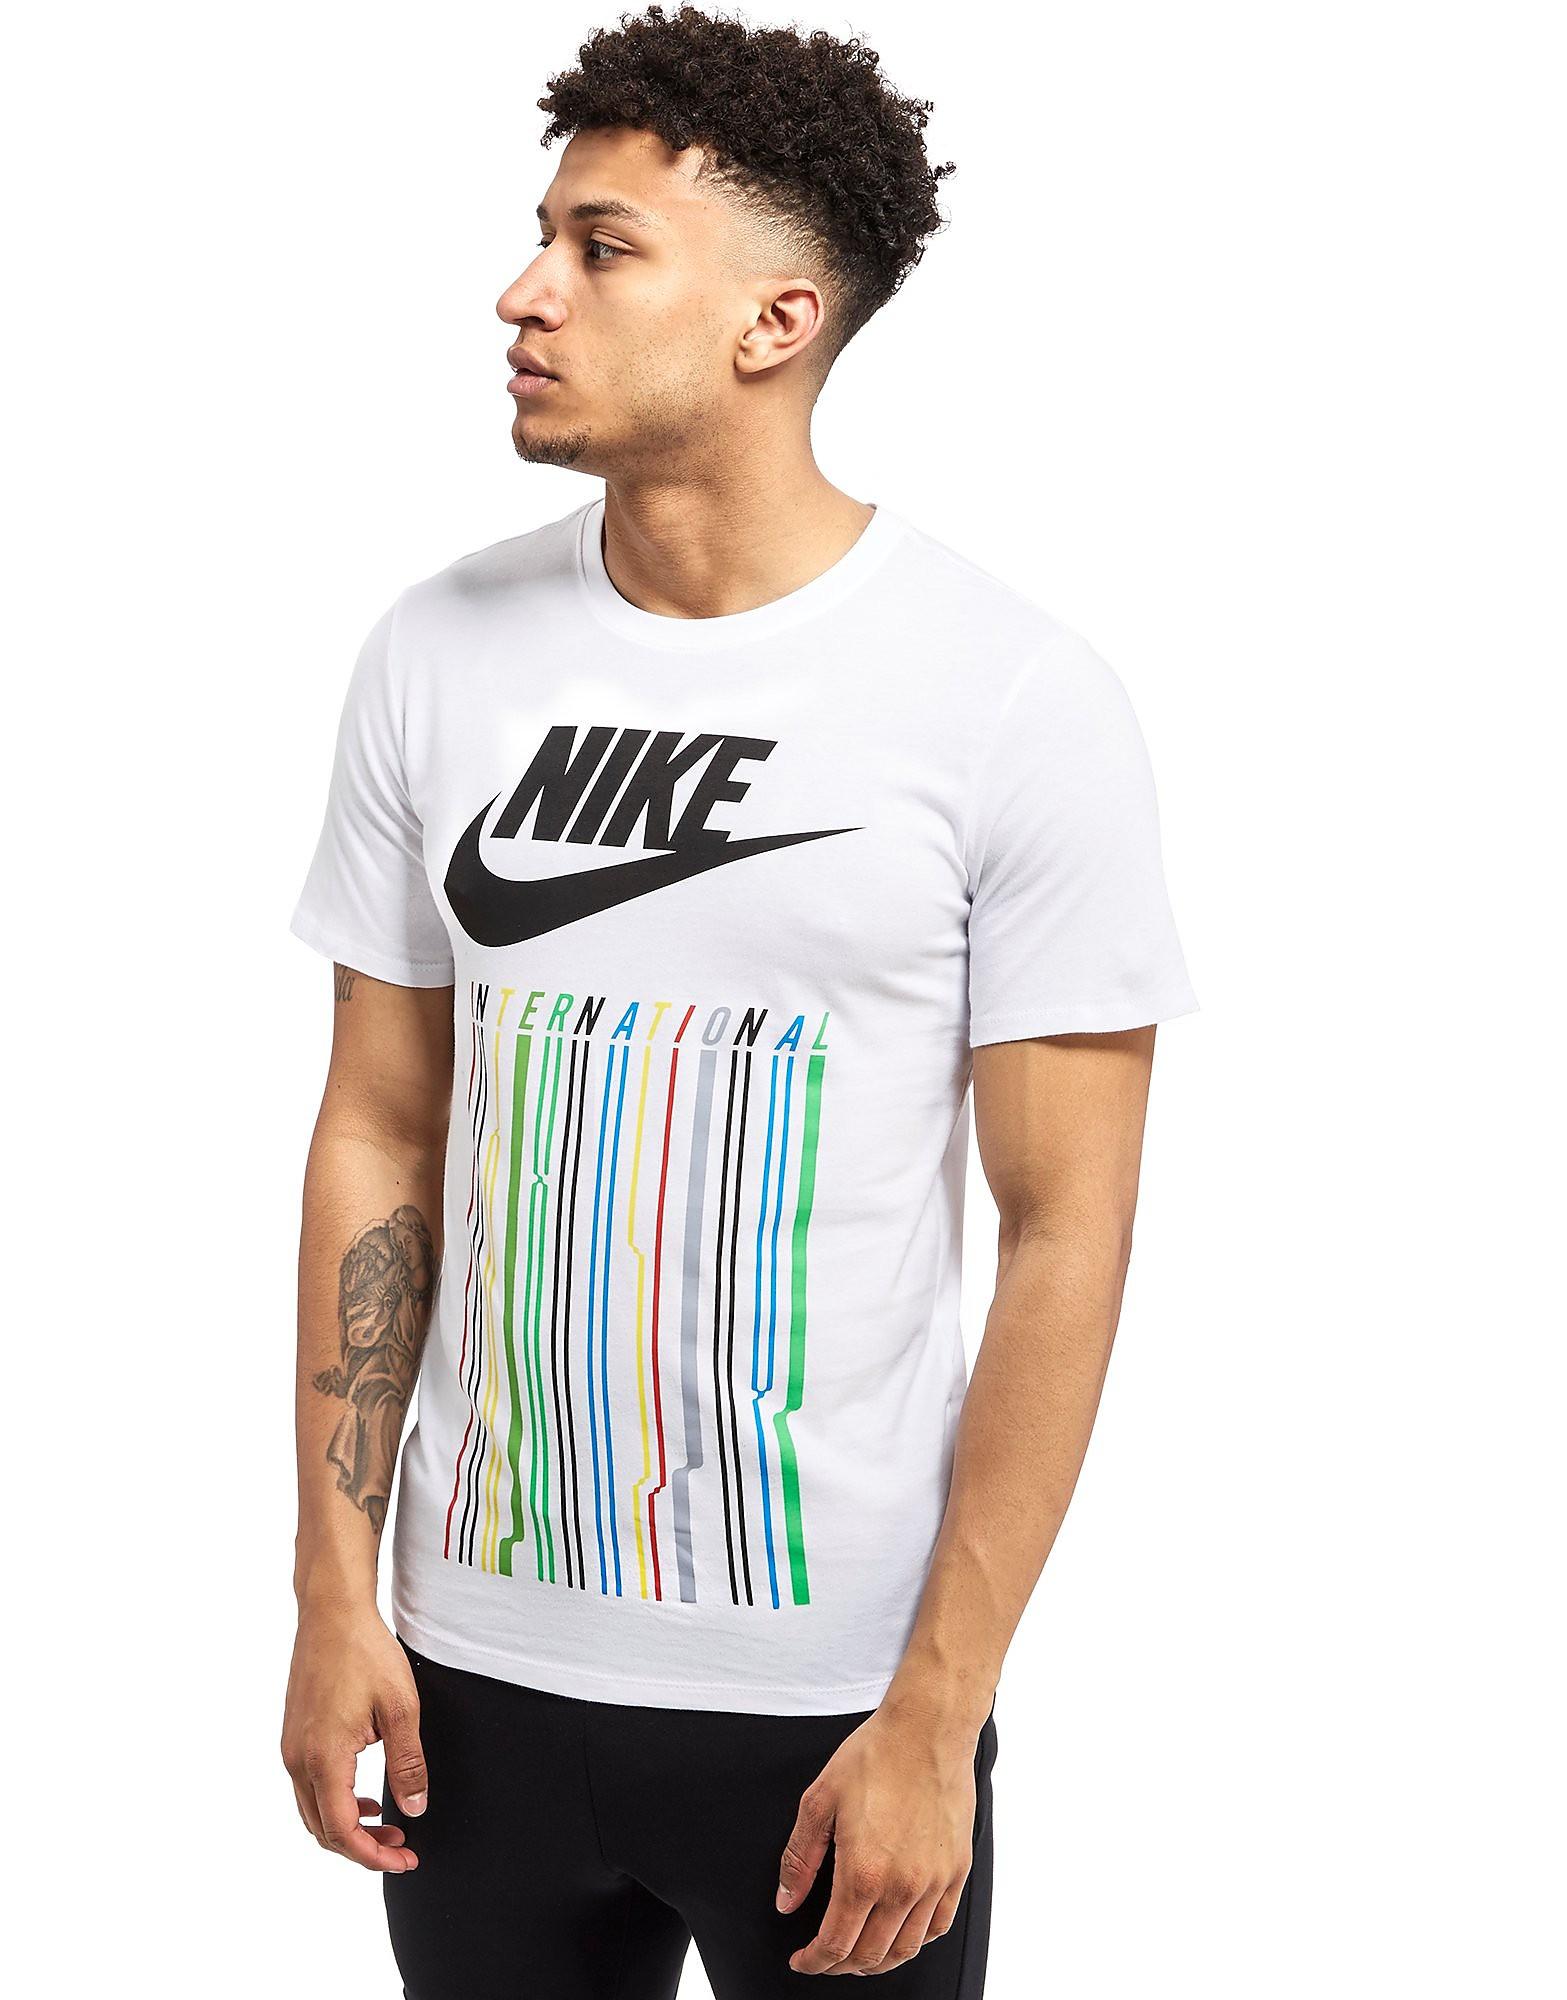 Nike International Barcode T-Shirt